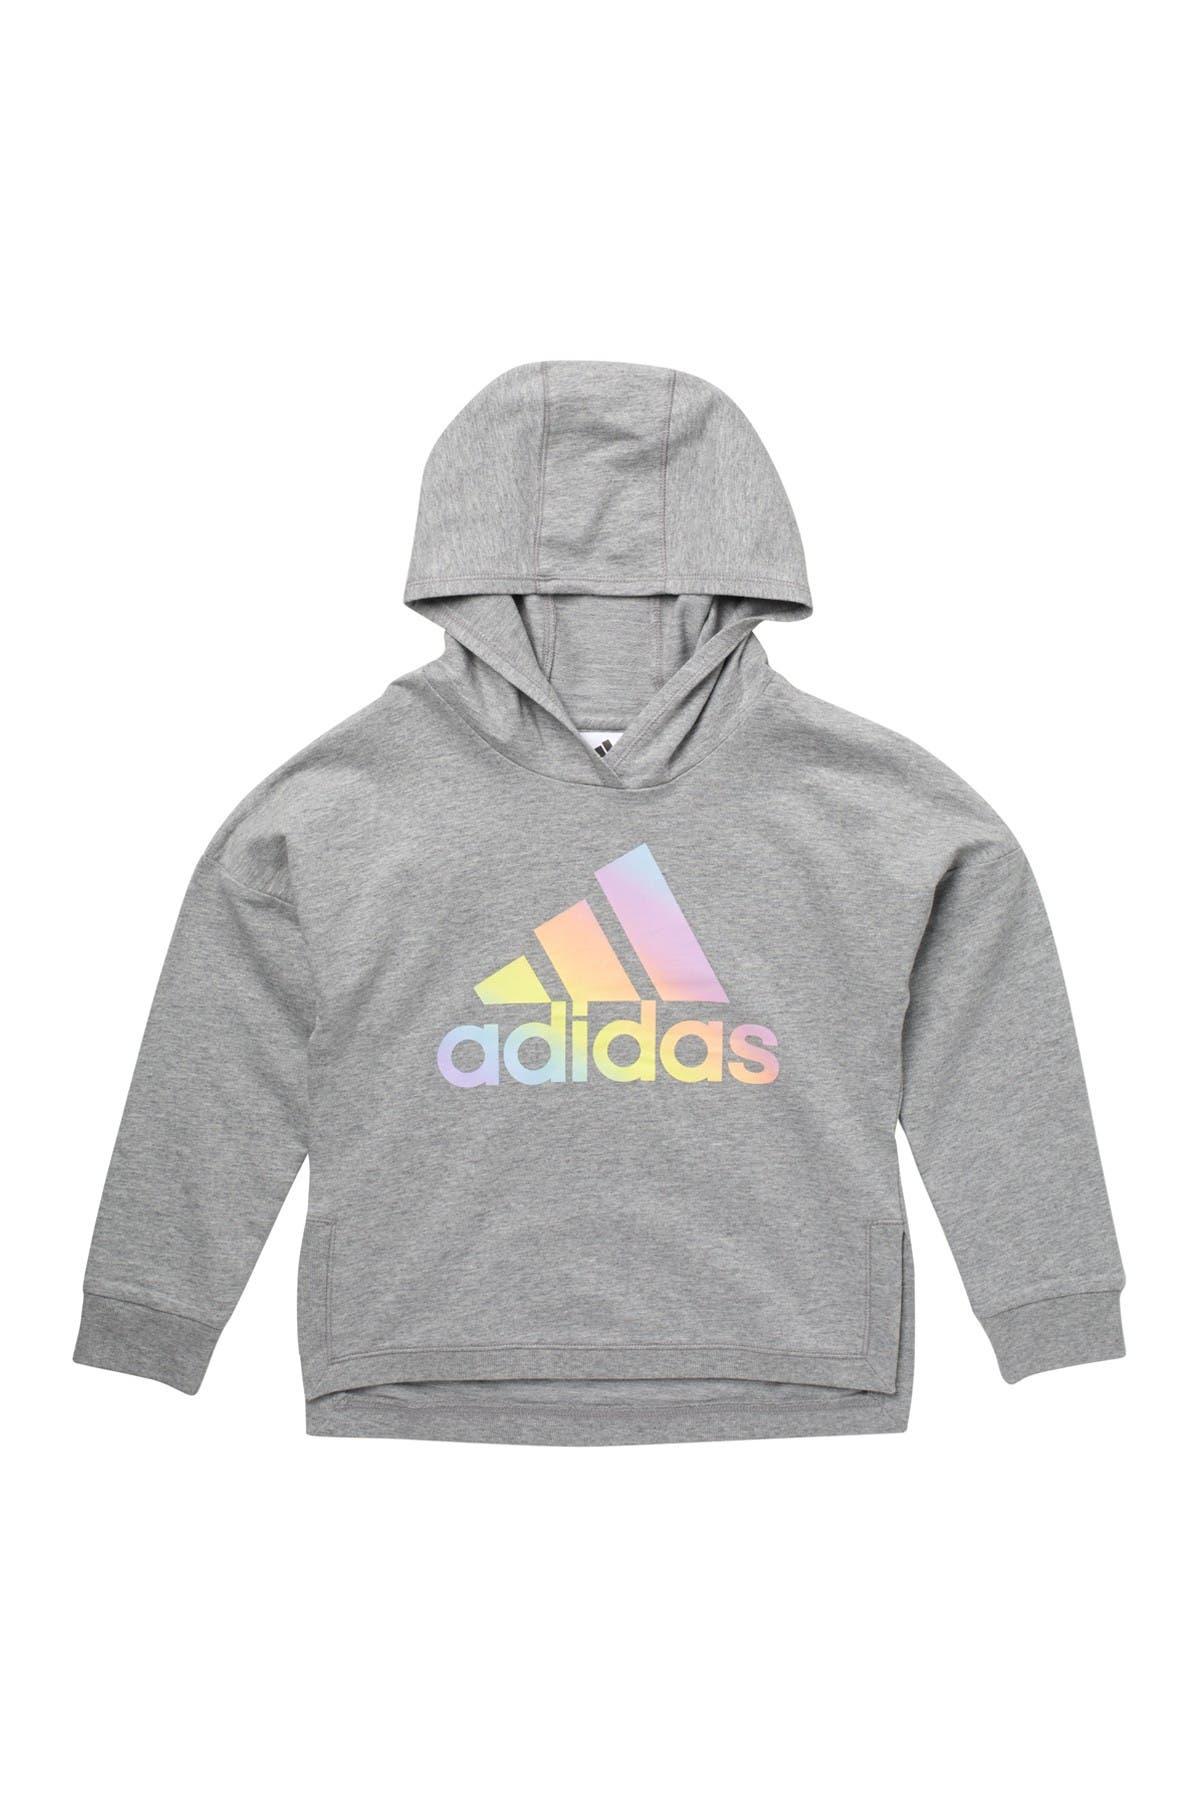 Image of ADIDAS ORIGINALS Long Sleeve Logo Hoodie